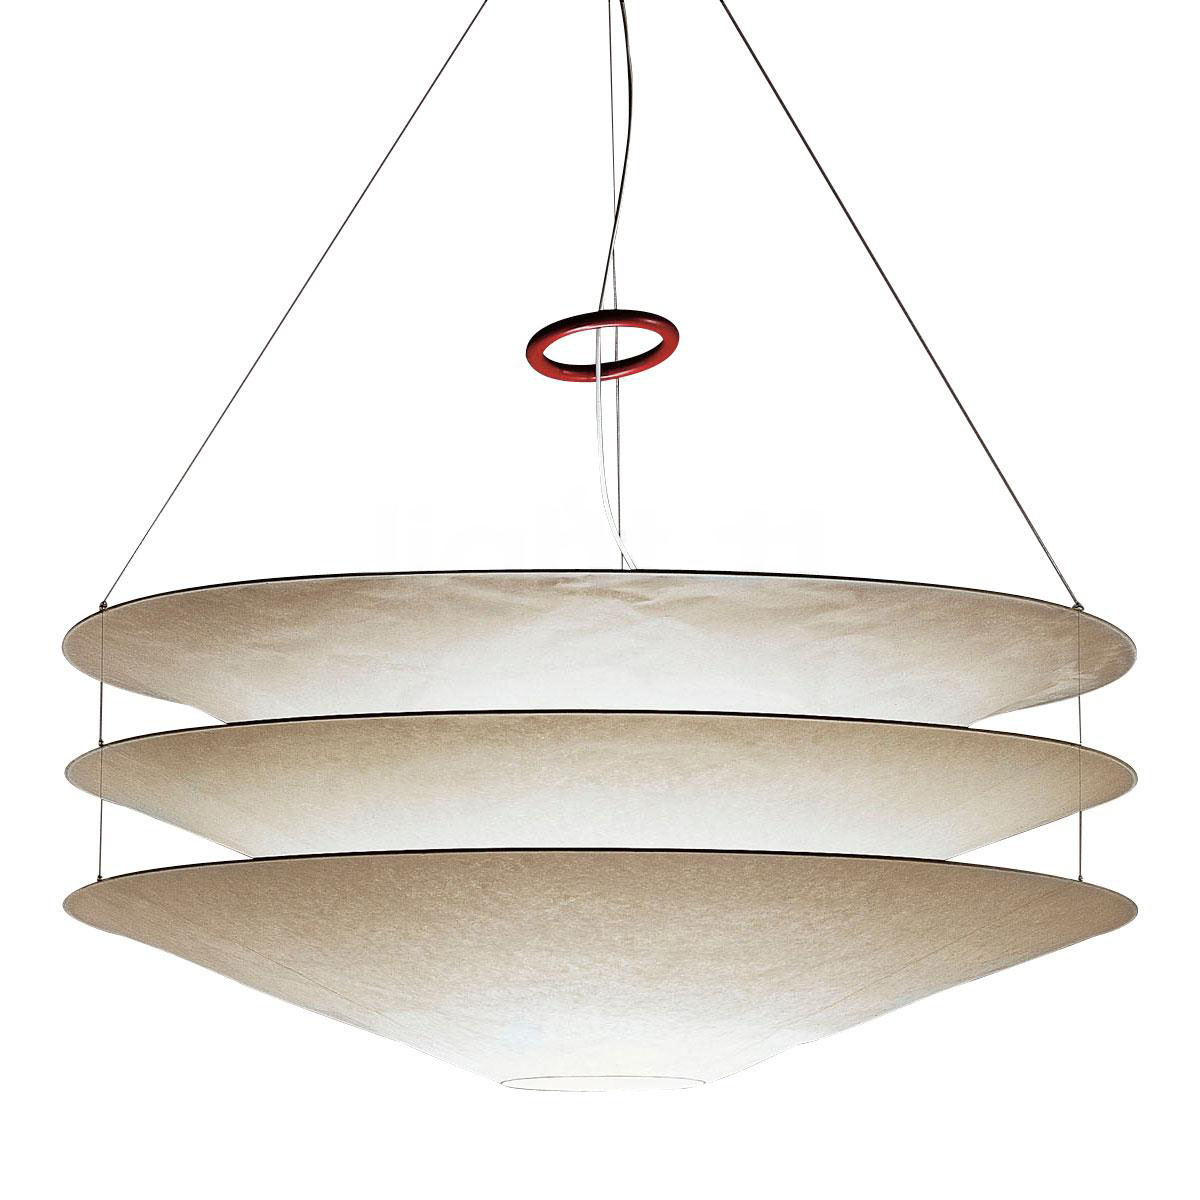 modern interior design: floatation™ floating FLOTATION 3-shade ...